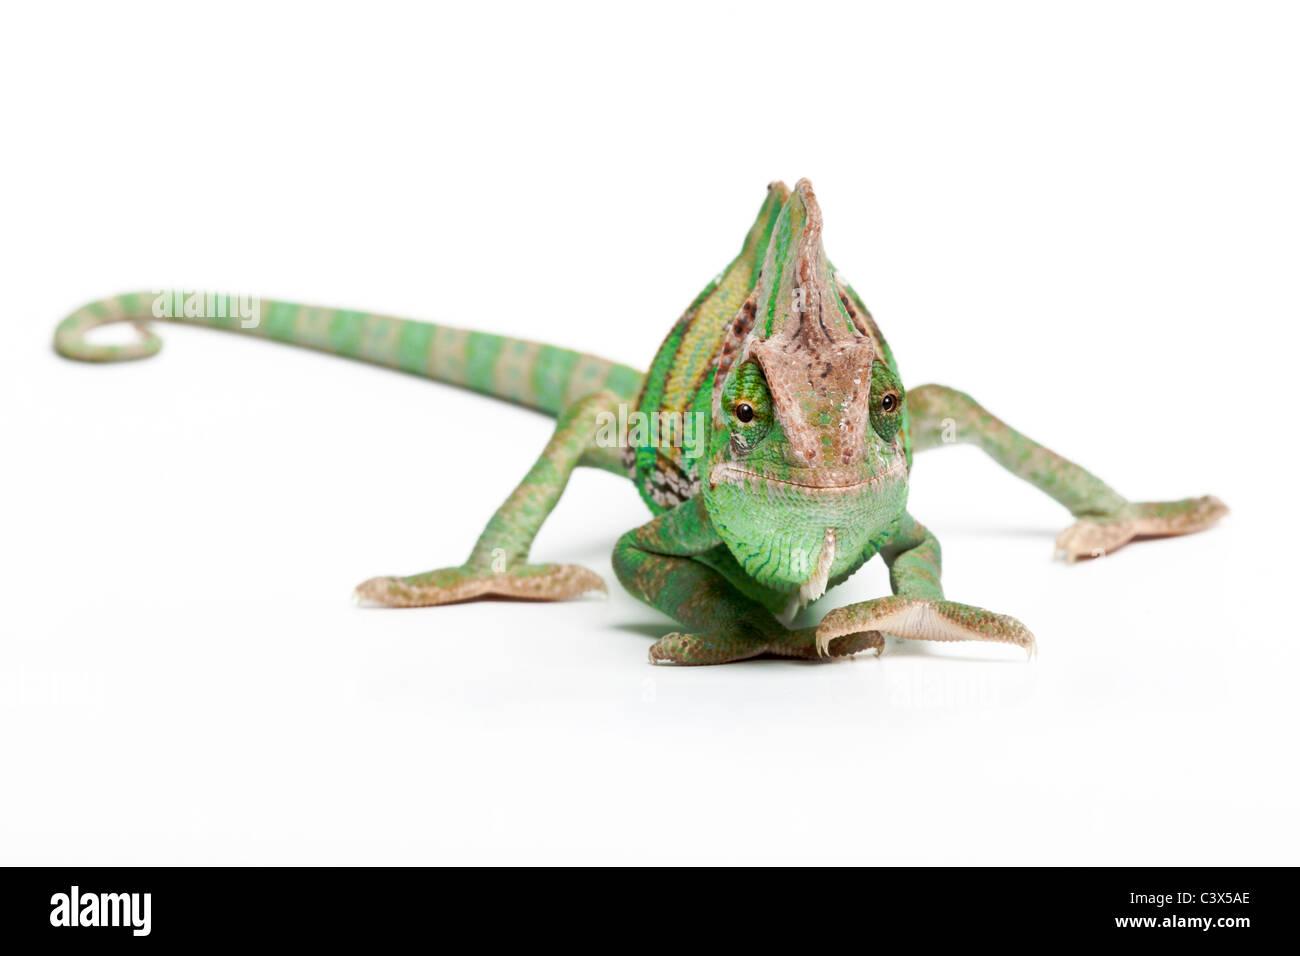 Veiled chameleon, Yemen chameleon, Chamaeleo calyptratus, male, Arabian Peninsula - Stock Image